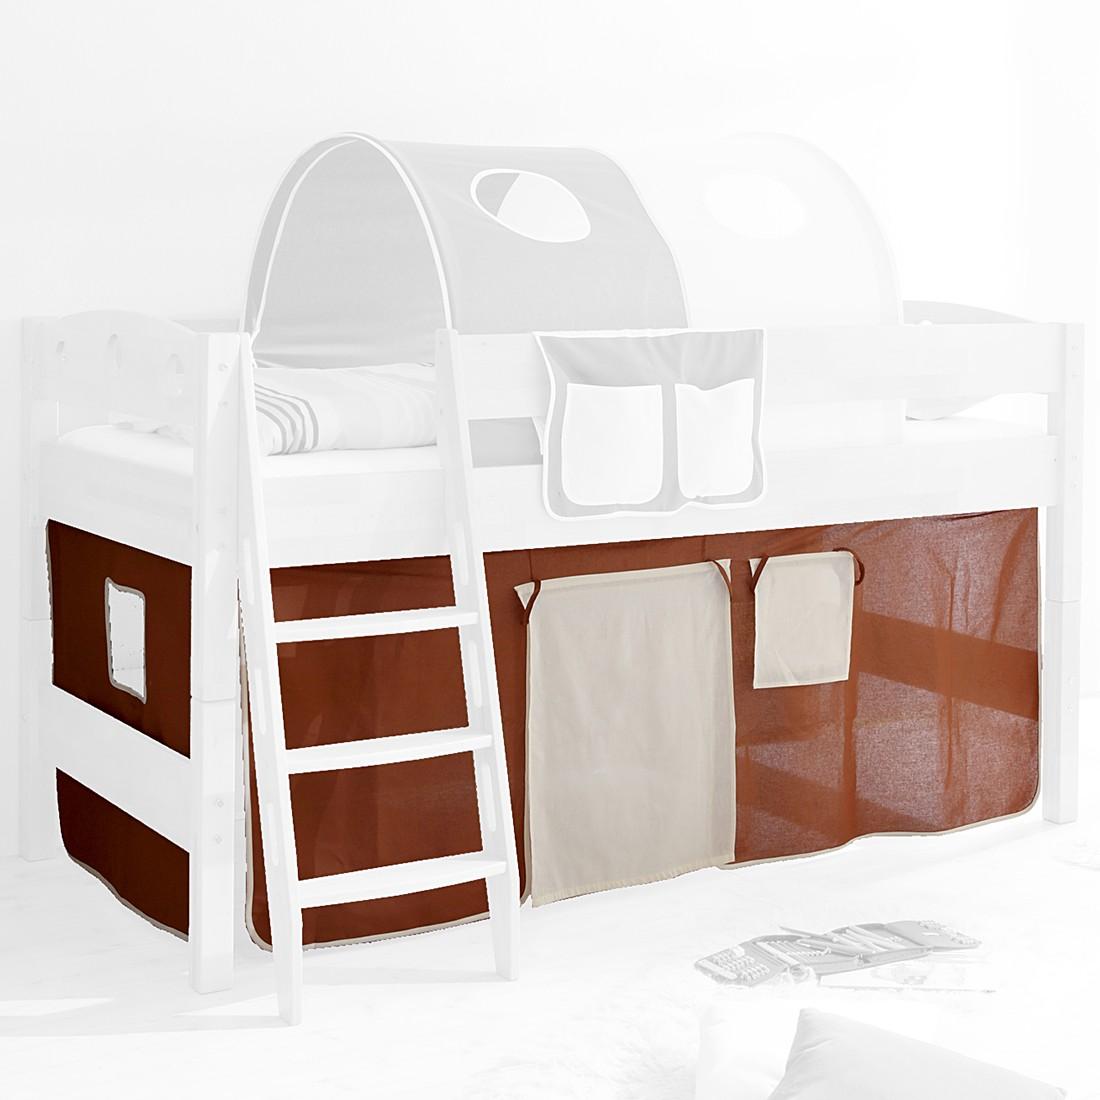 Home 24 - Rideau lobi - 100 % coton - beige / marron, ticaa